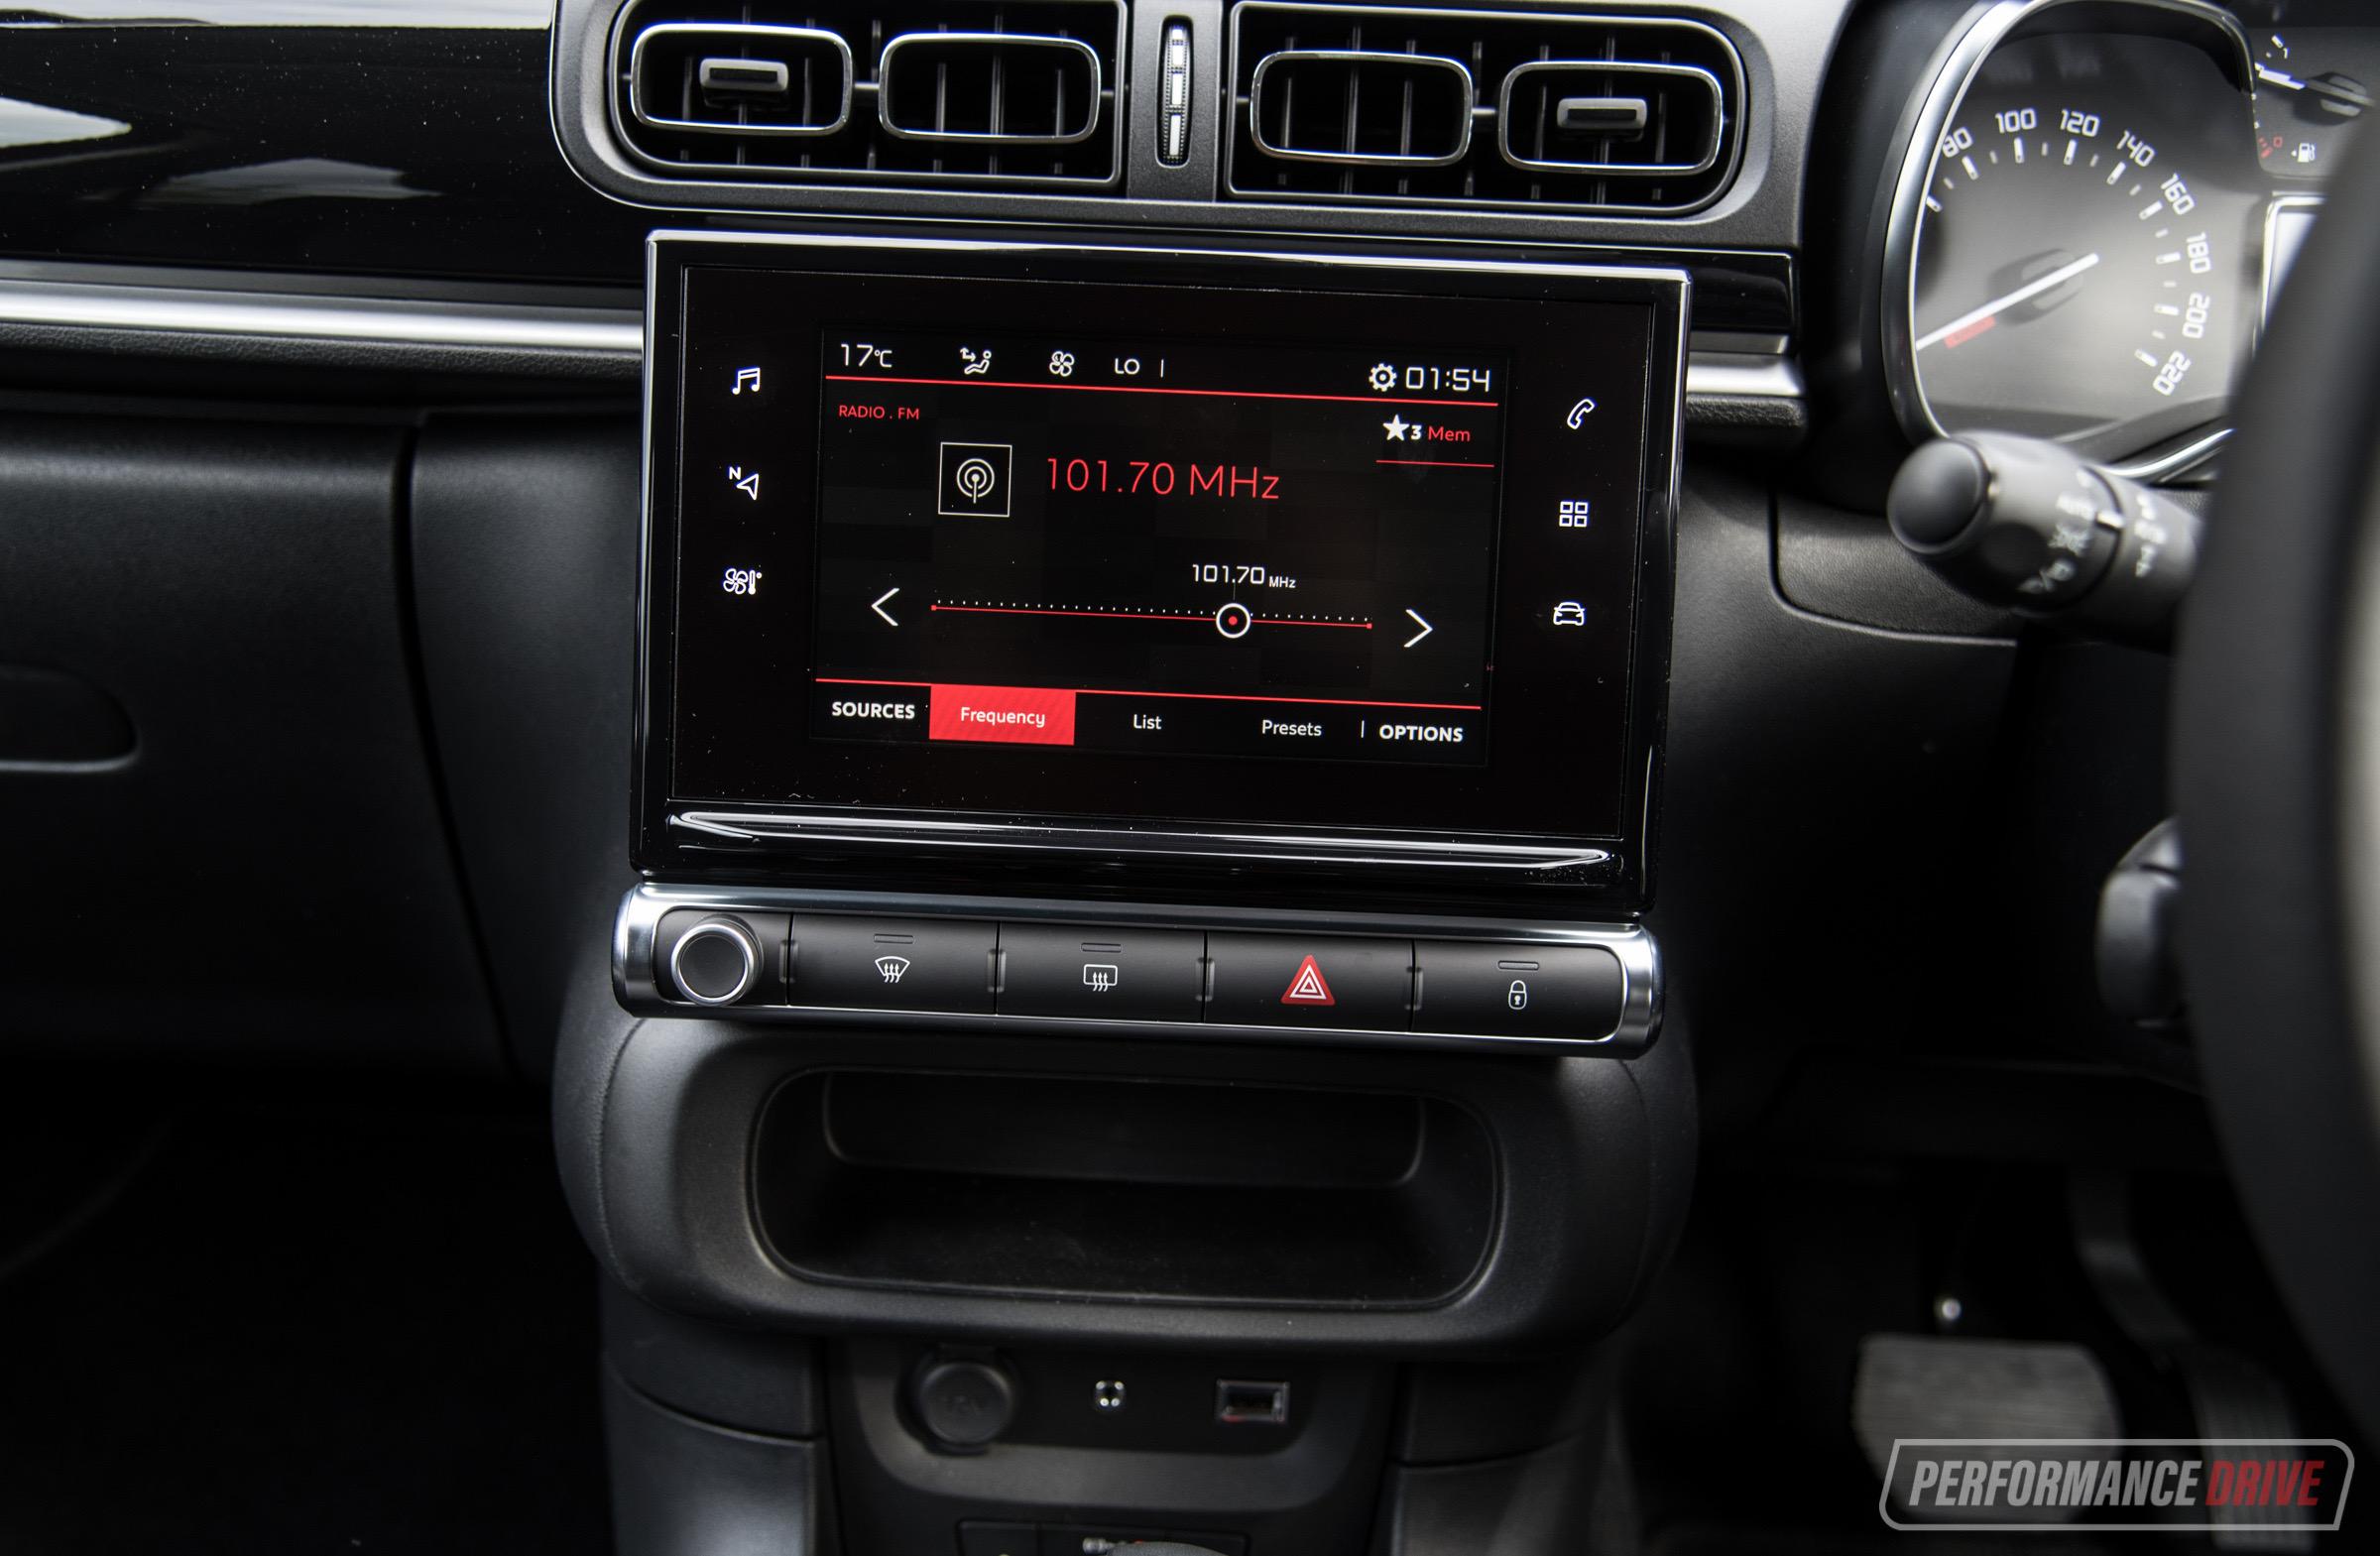 2018 Citroen C3 review (video) | PerformanceDrive